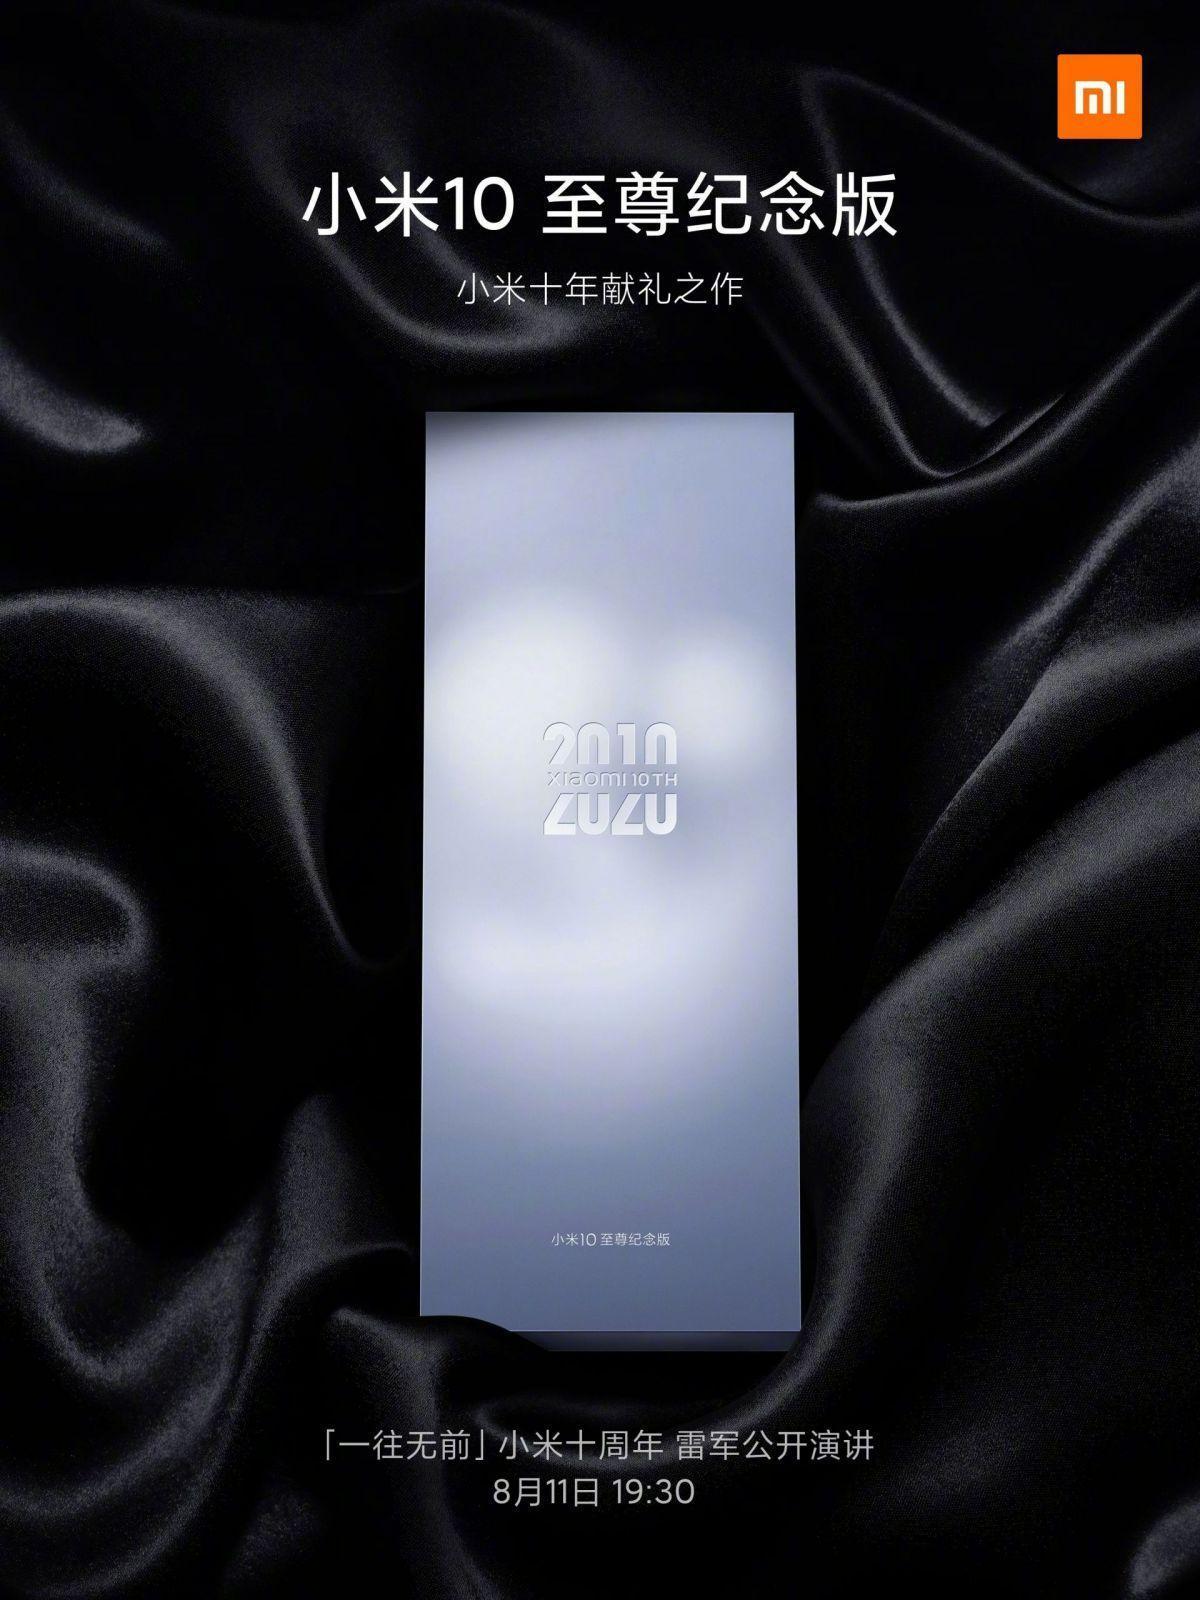 Xiaomi подтвердила запуск ещё одного флагмана - Mi 10 Extreme Commemorative Edition (xiaomi mi 10 extreme commerative edition august 11 launch scaled)